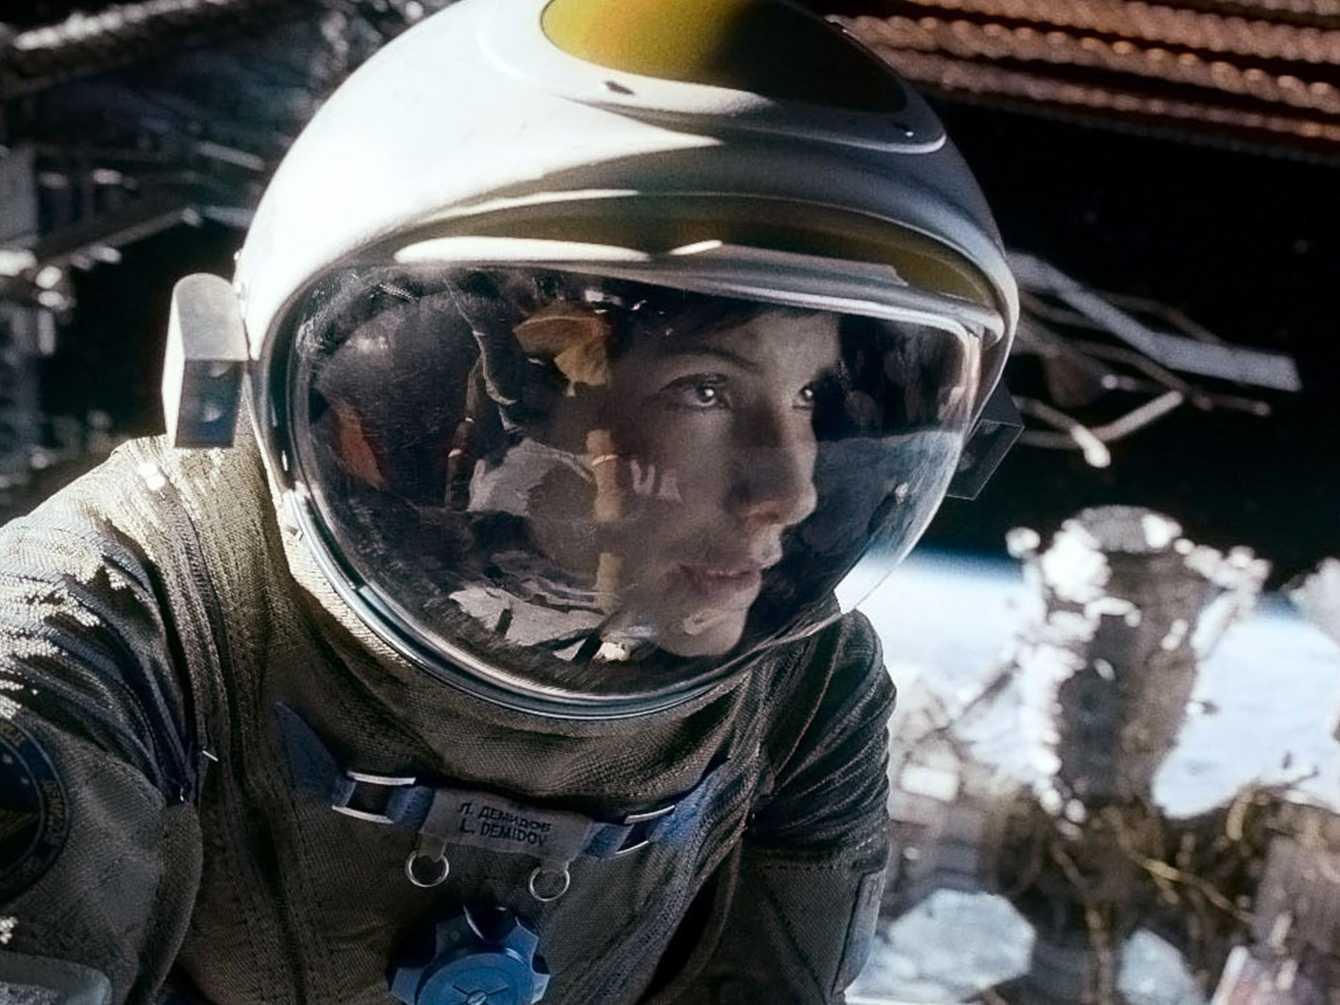 GRAVITY Tops Rentrak's Movies on Demand Titles for Week Ending 3/2